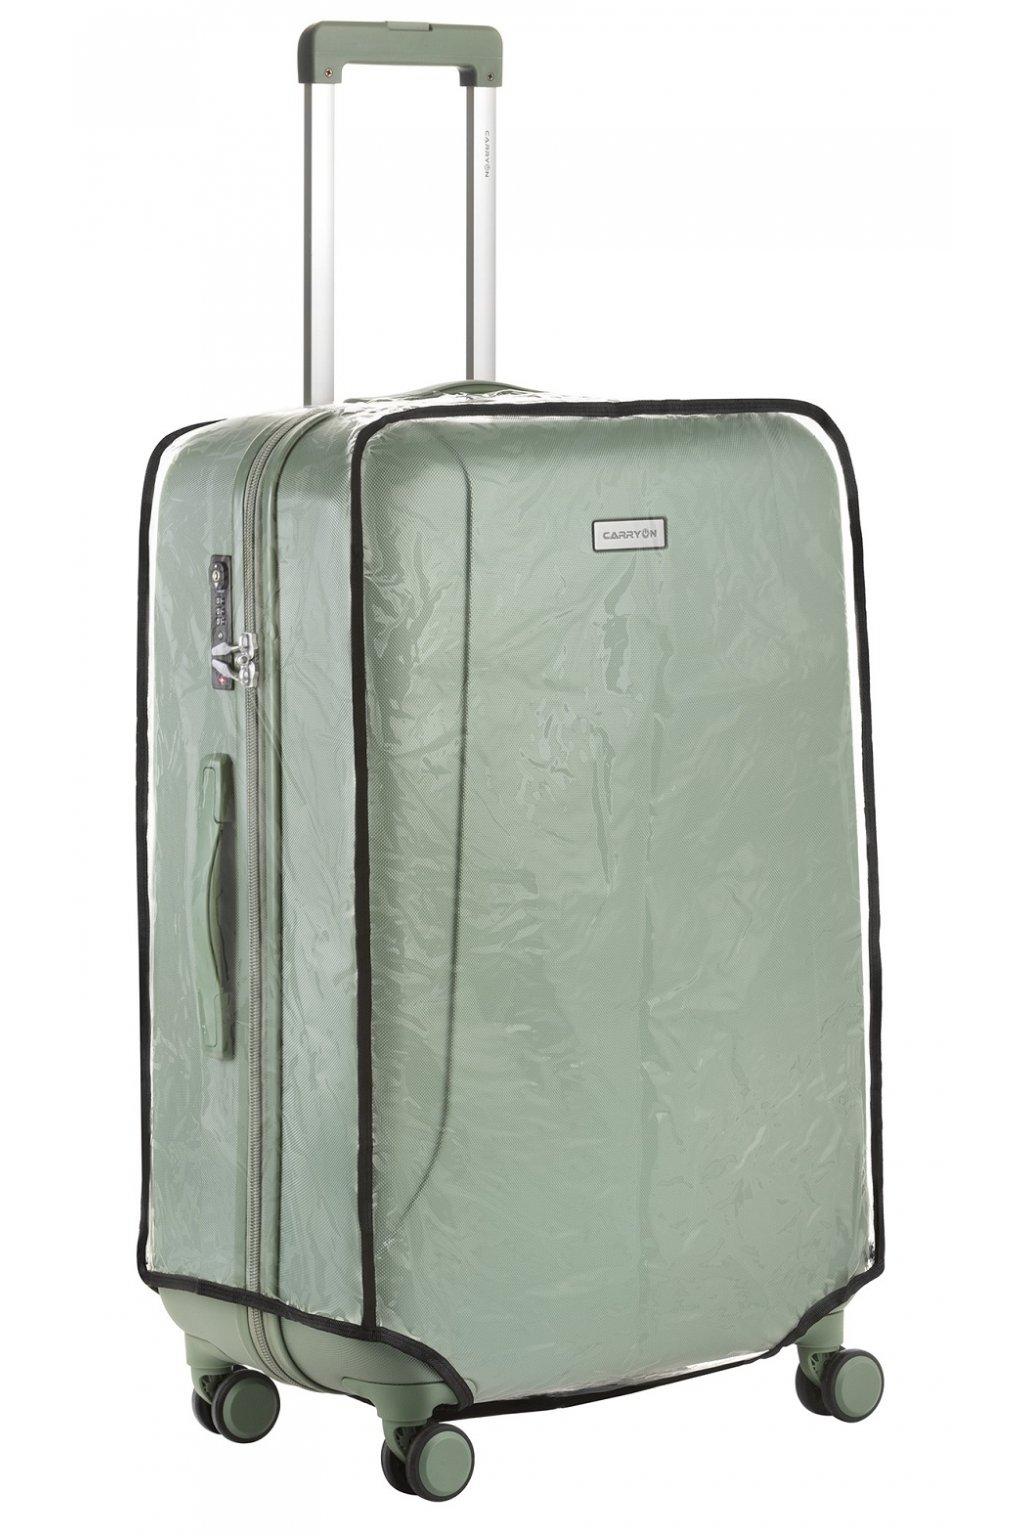 kufrland carryon transparentlarge obal na kufr (1)